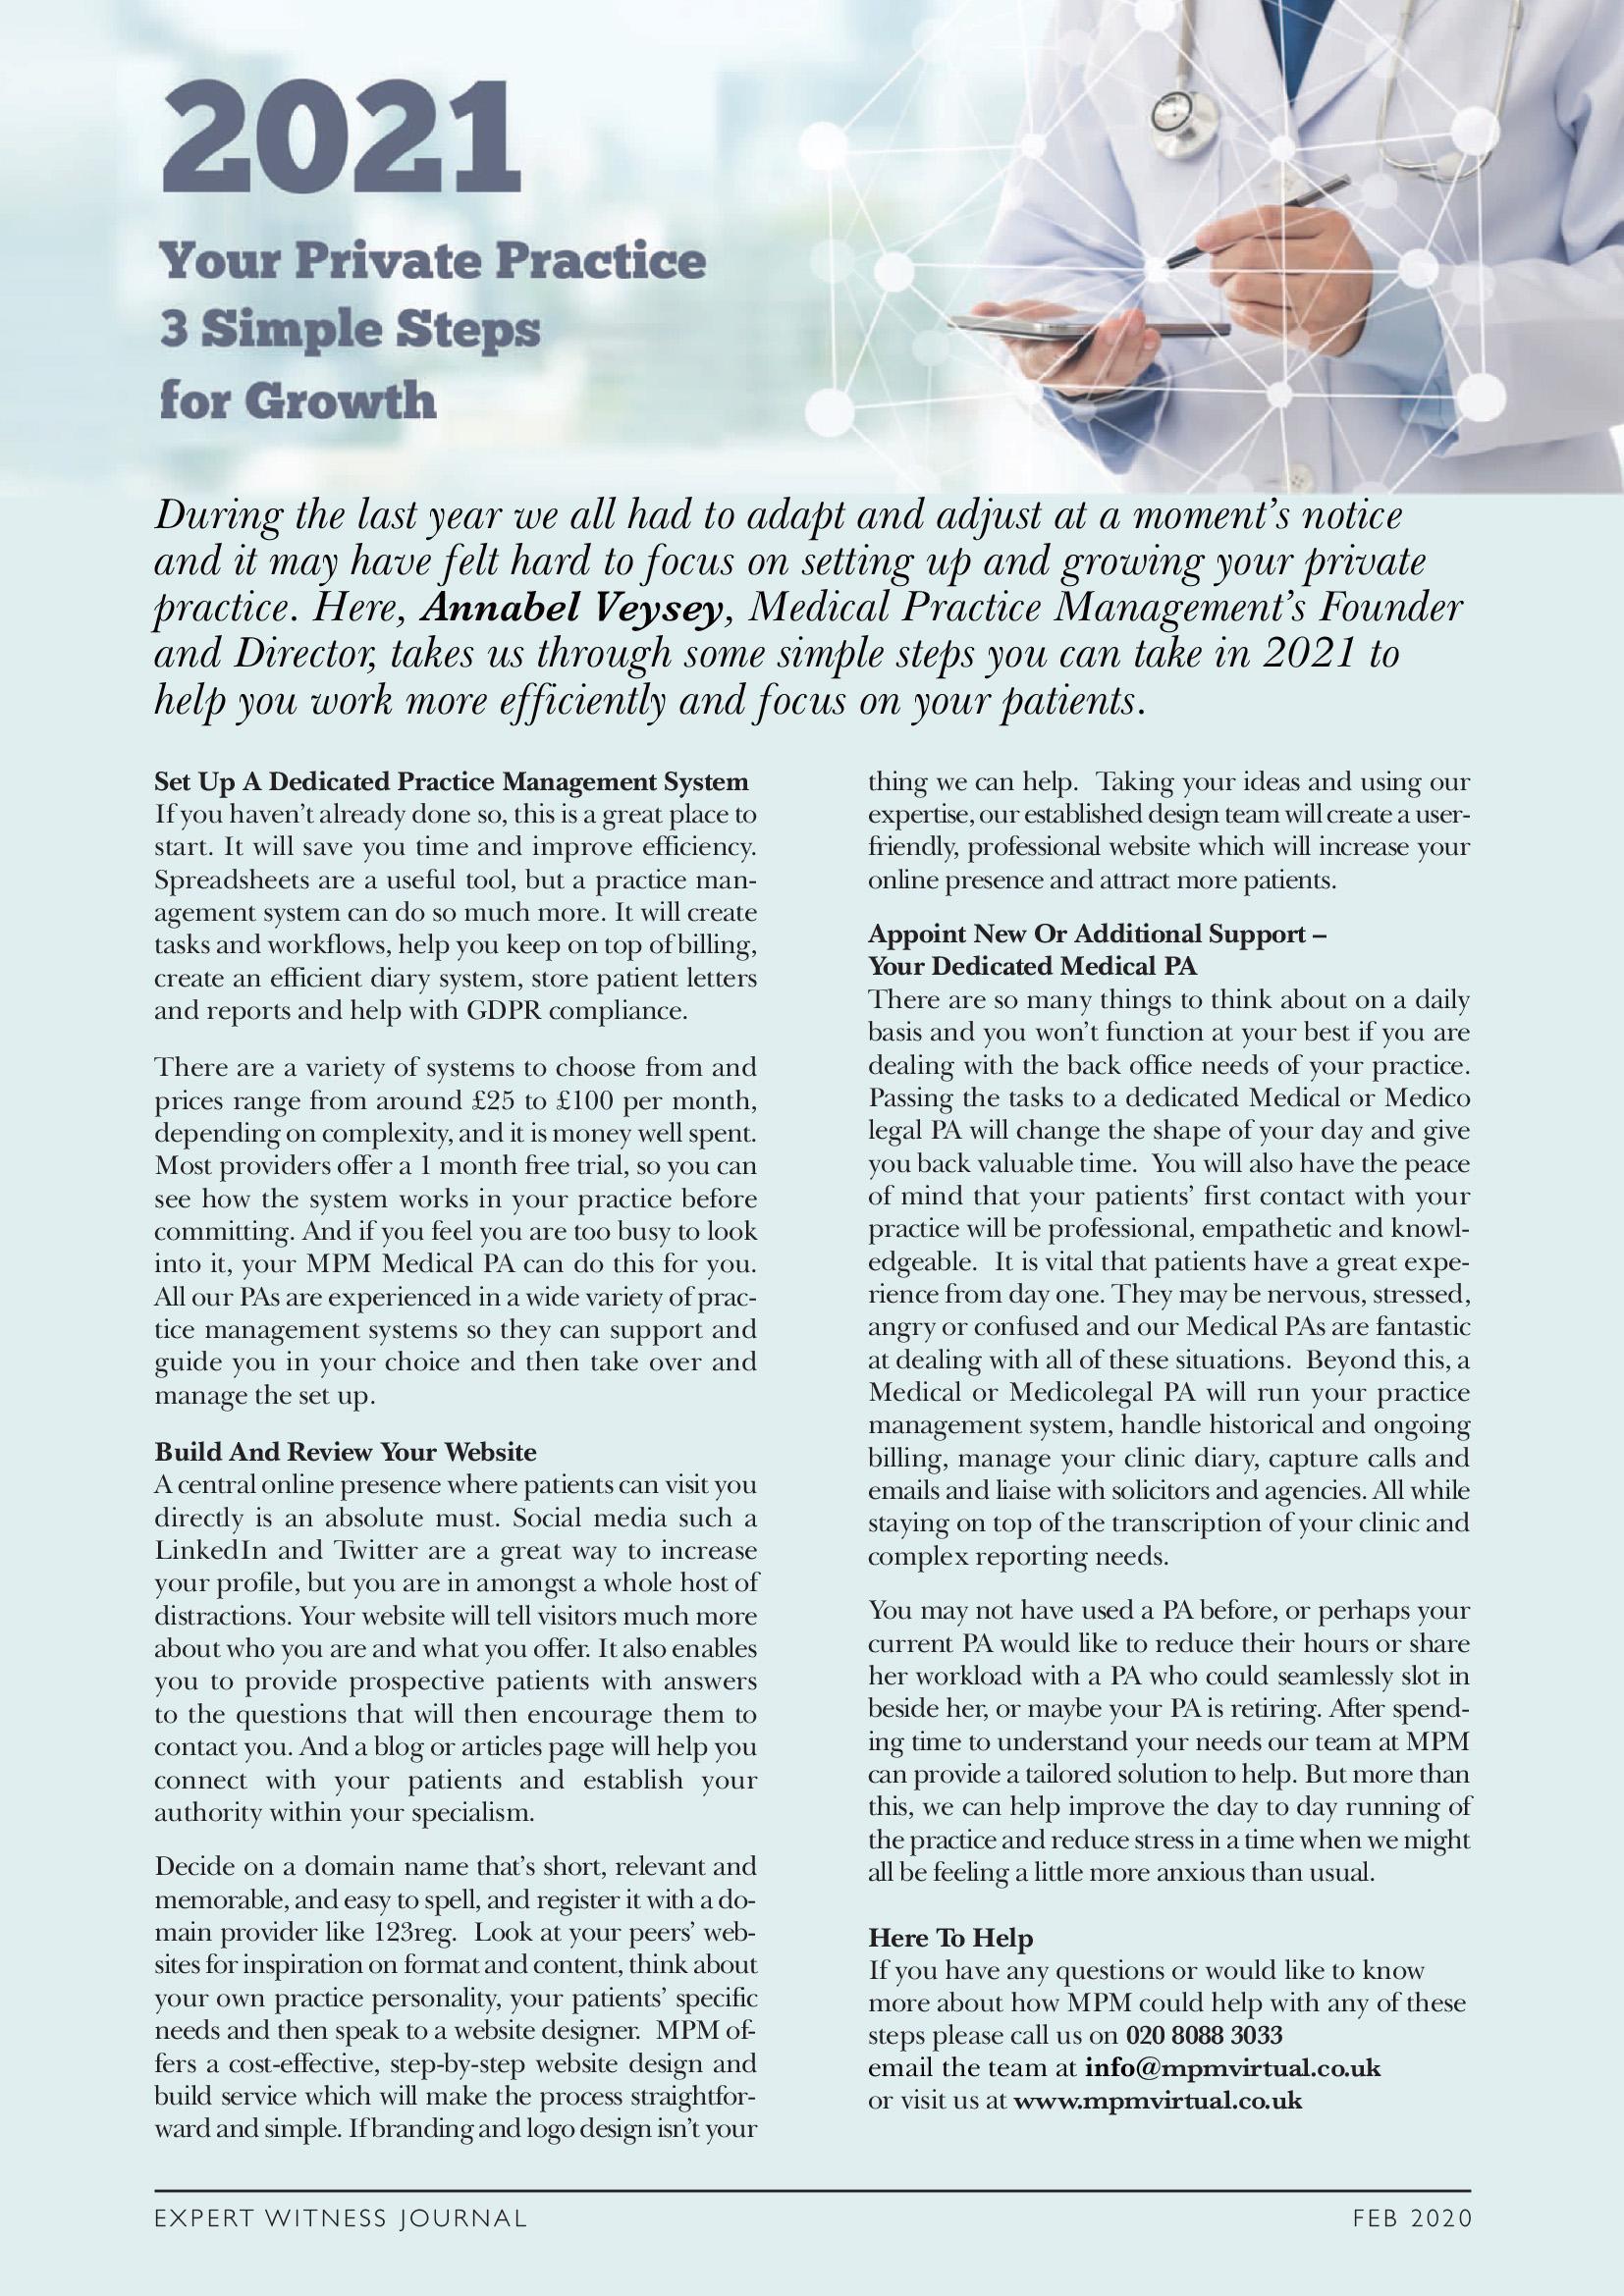 mpm-article-jan-2021